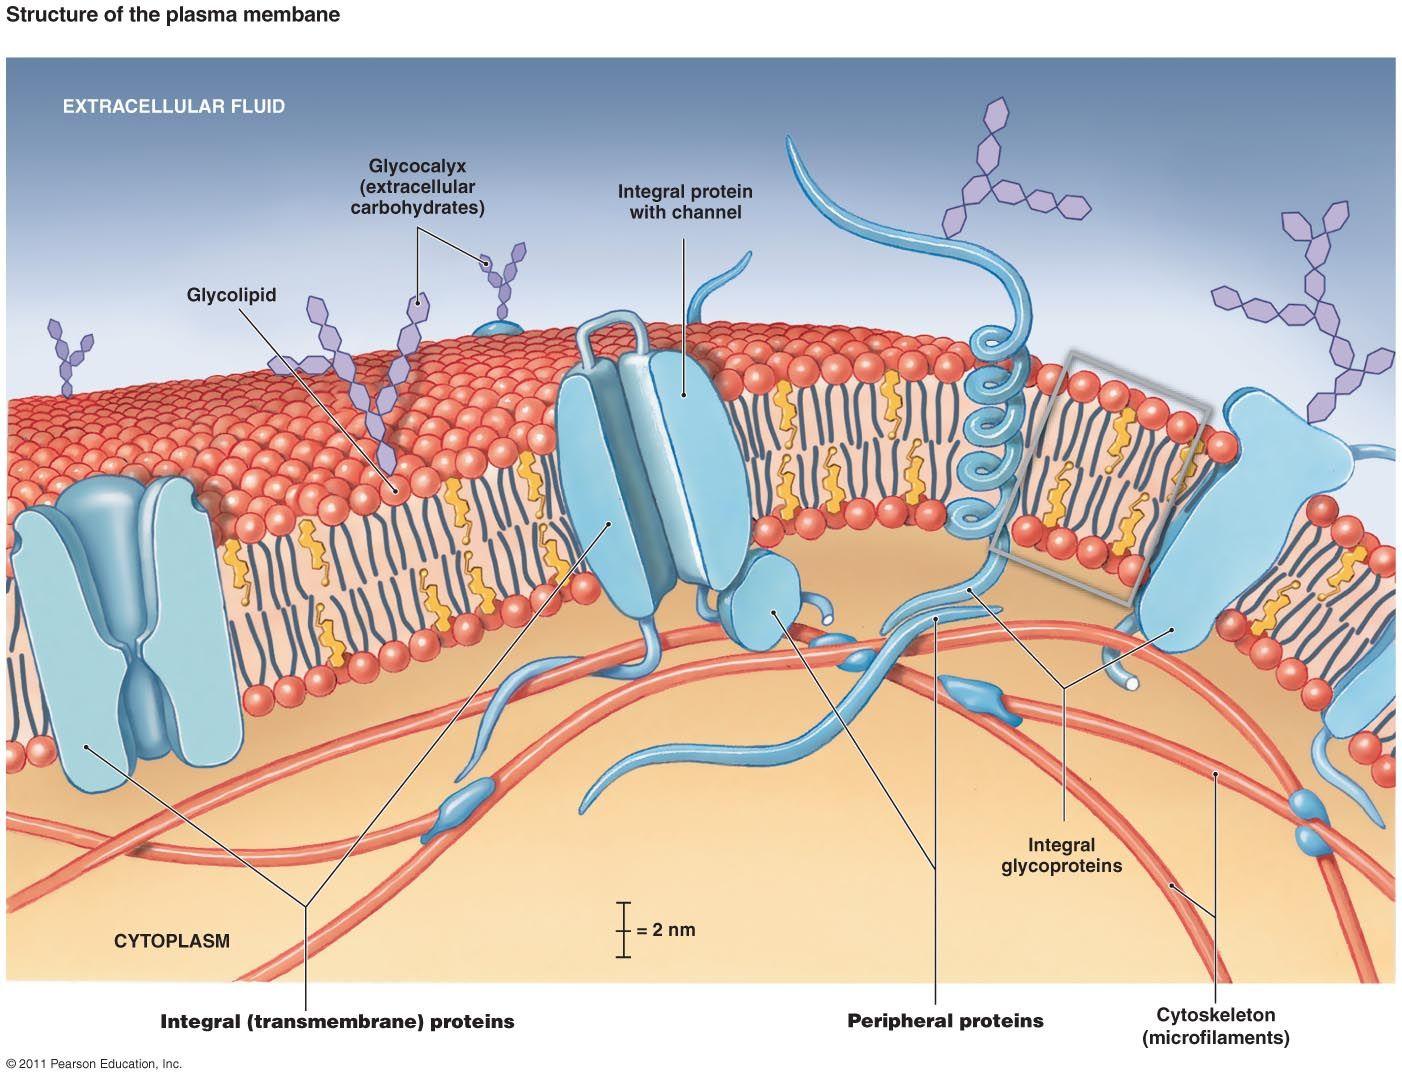 Cell Membrane Model Bing Images Cell membrane, Plasma